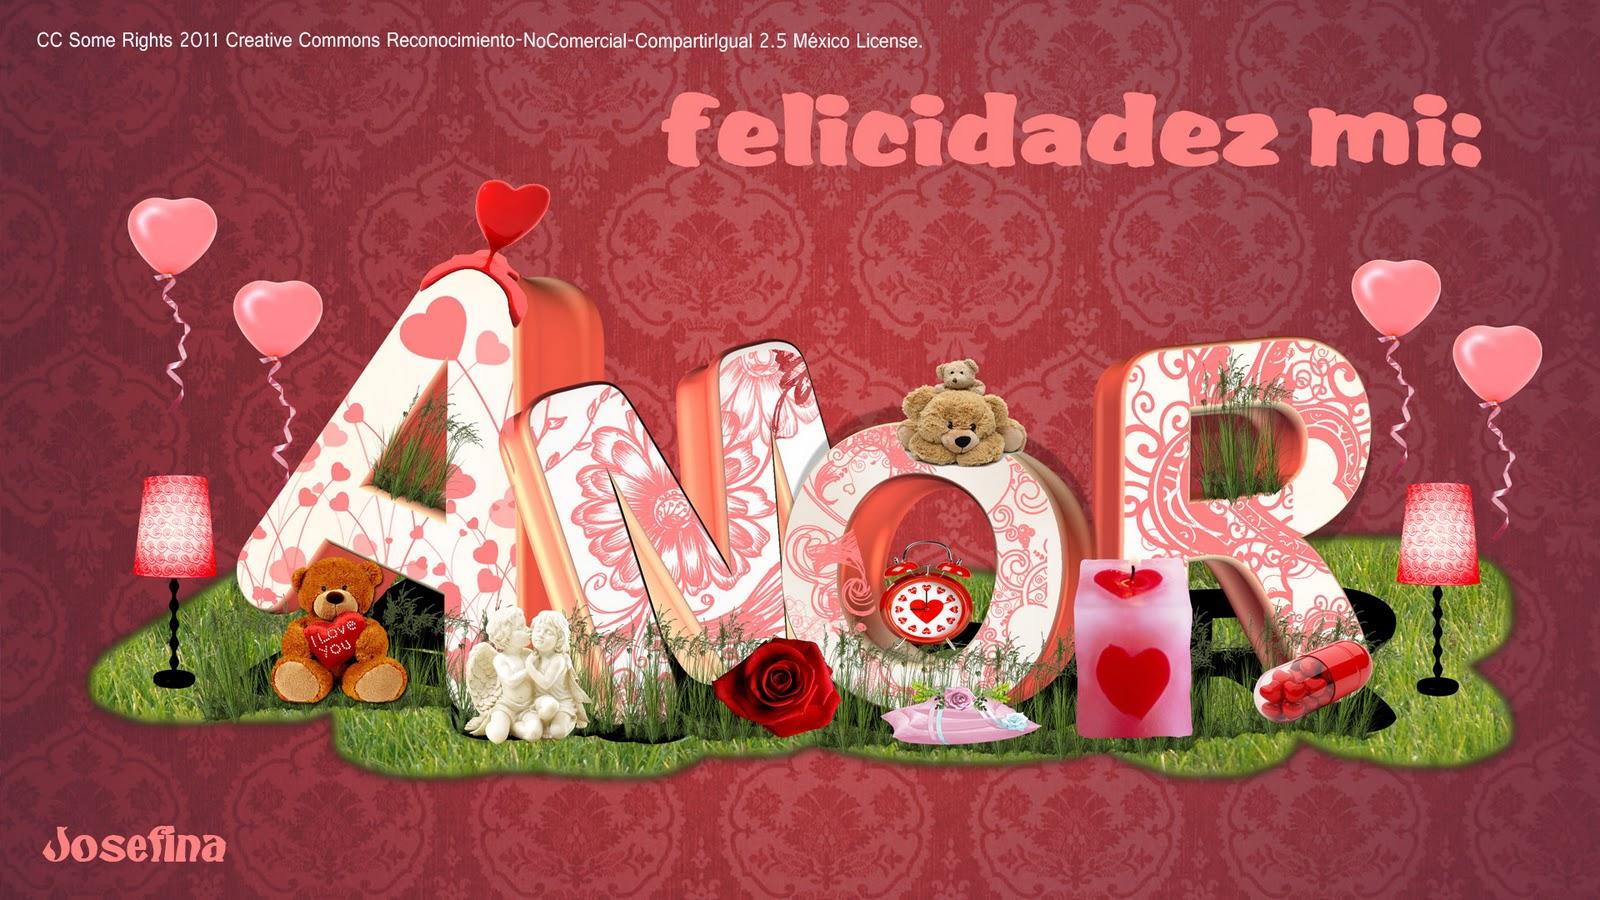 Iphone 5 Wallpaper Pink Wwwallpaper Blogspot Mx Wall Felicidades Mi Amor